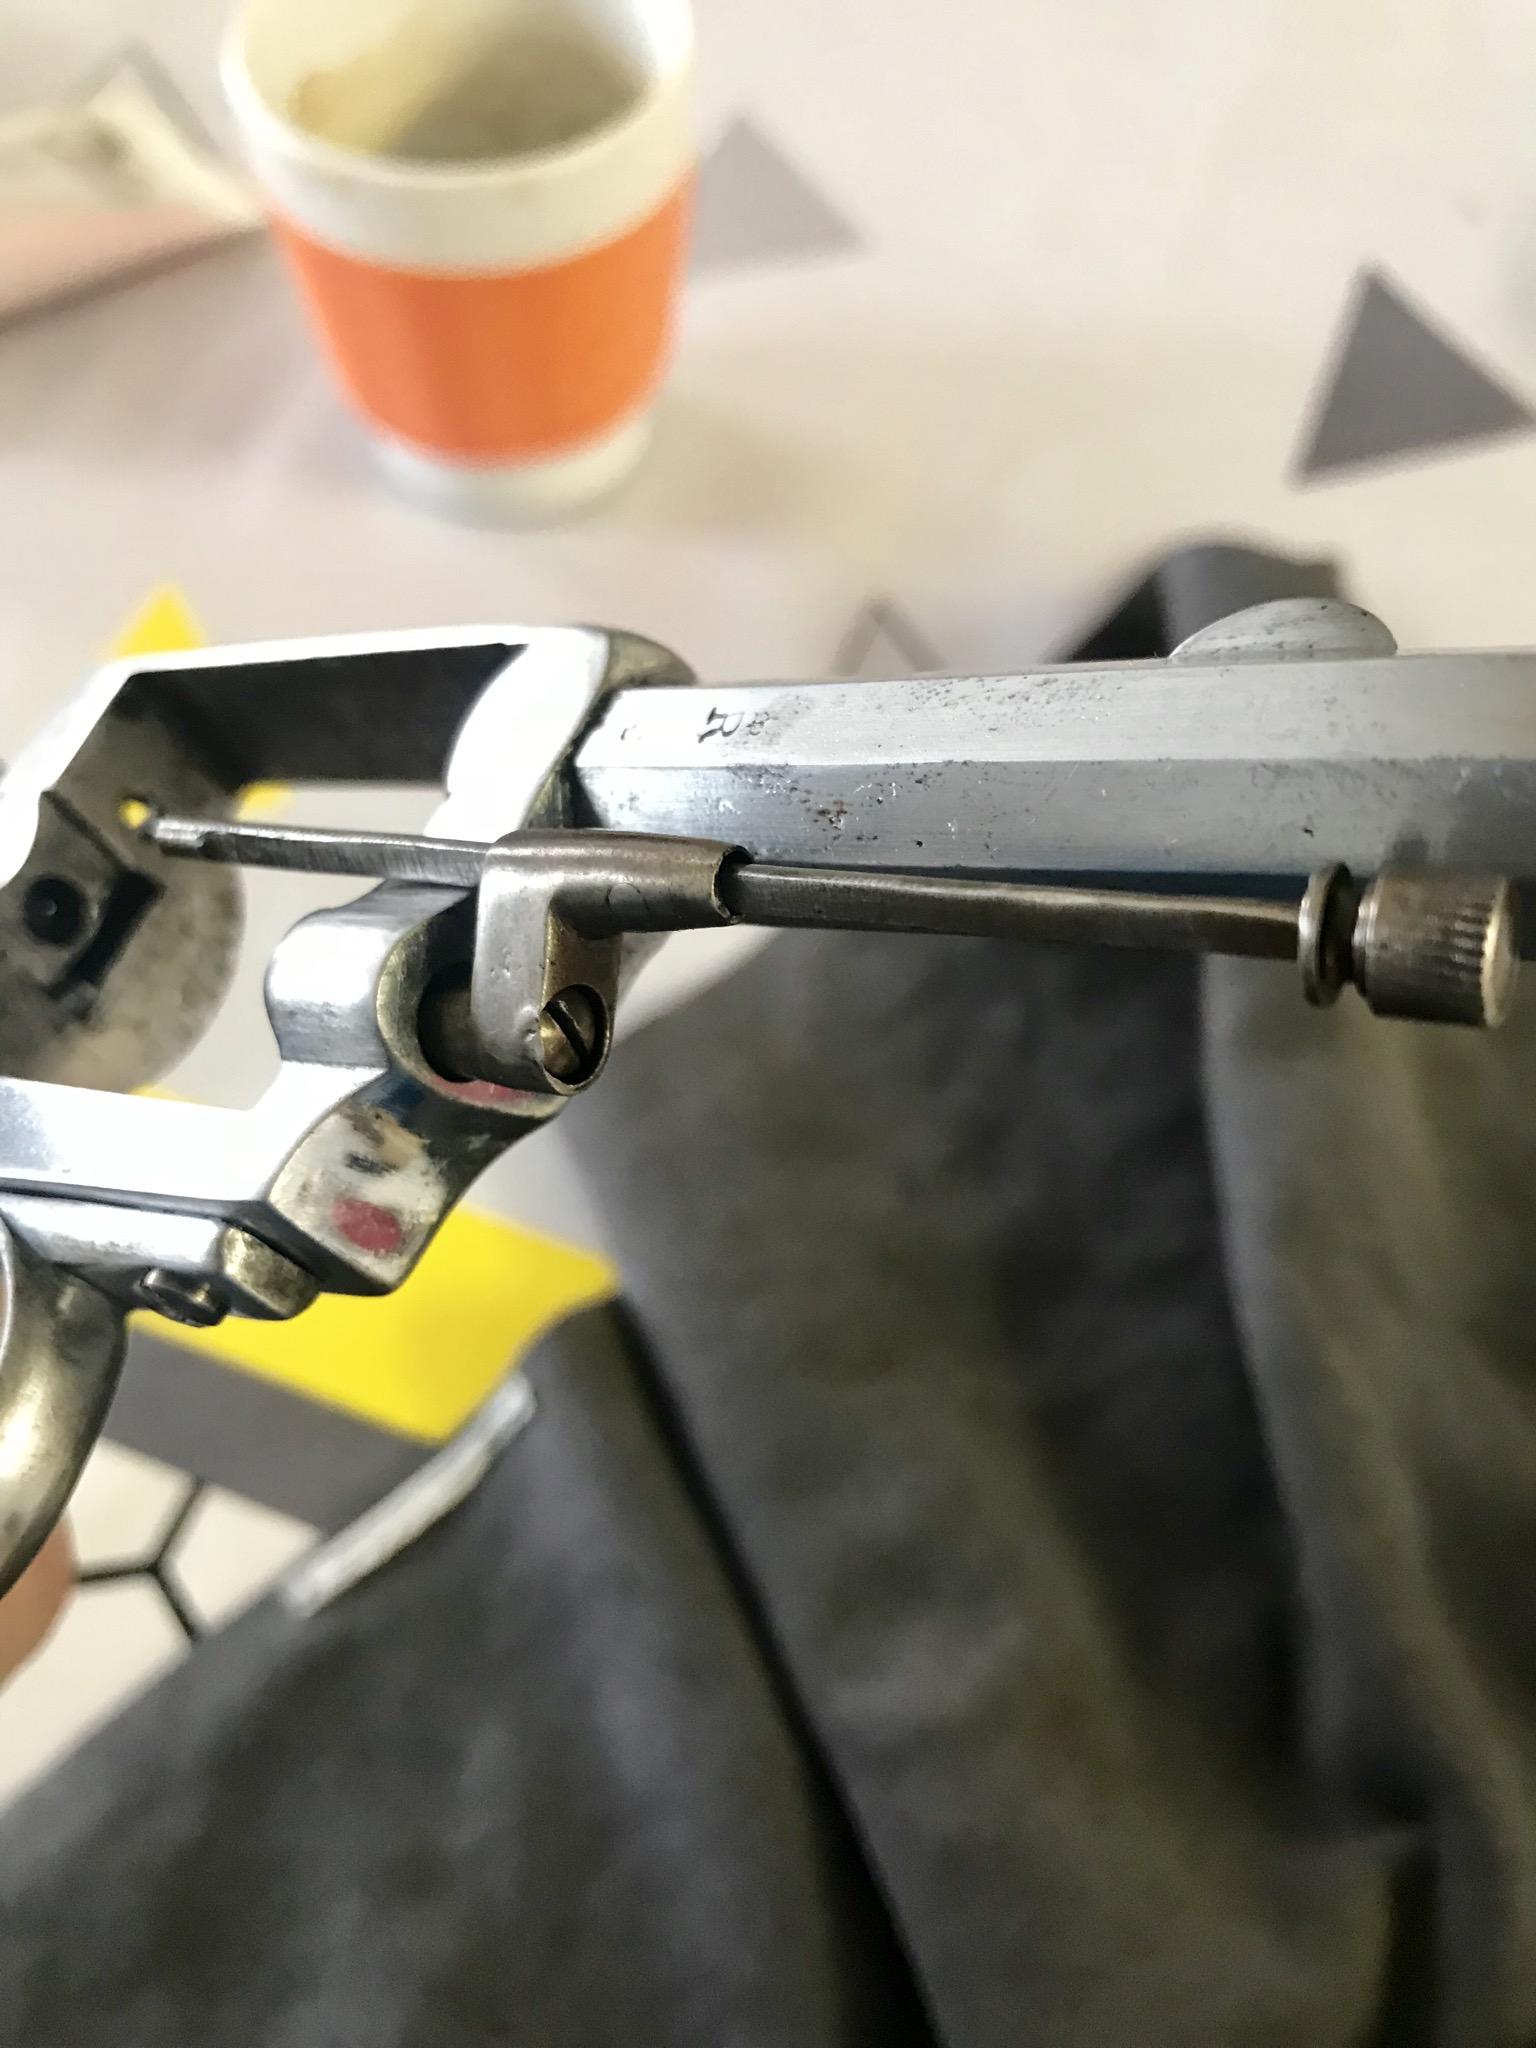 Tige d'extraction se bloque pas revolver type bulldog  D7d5ad10